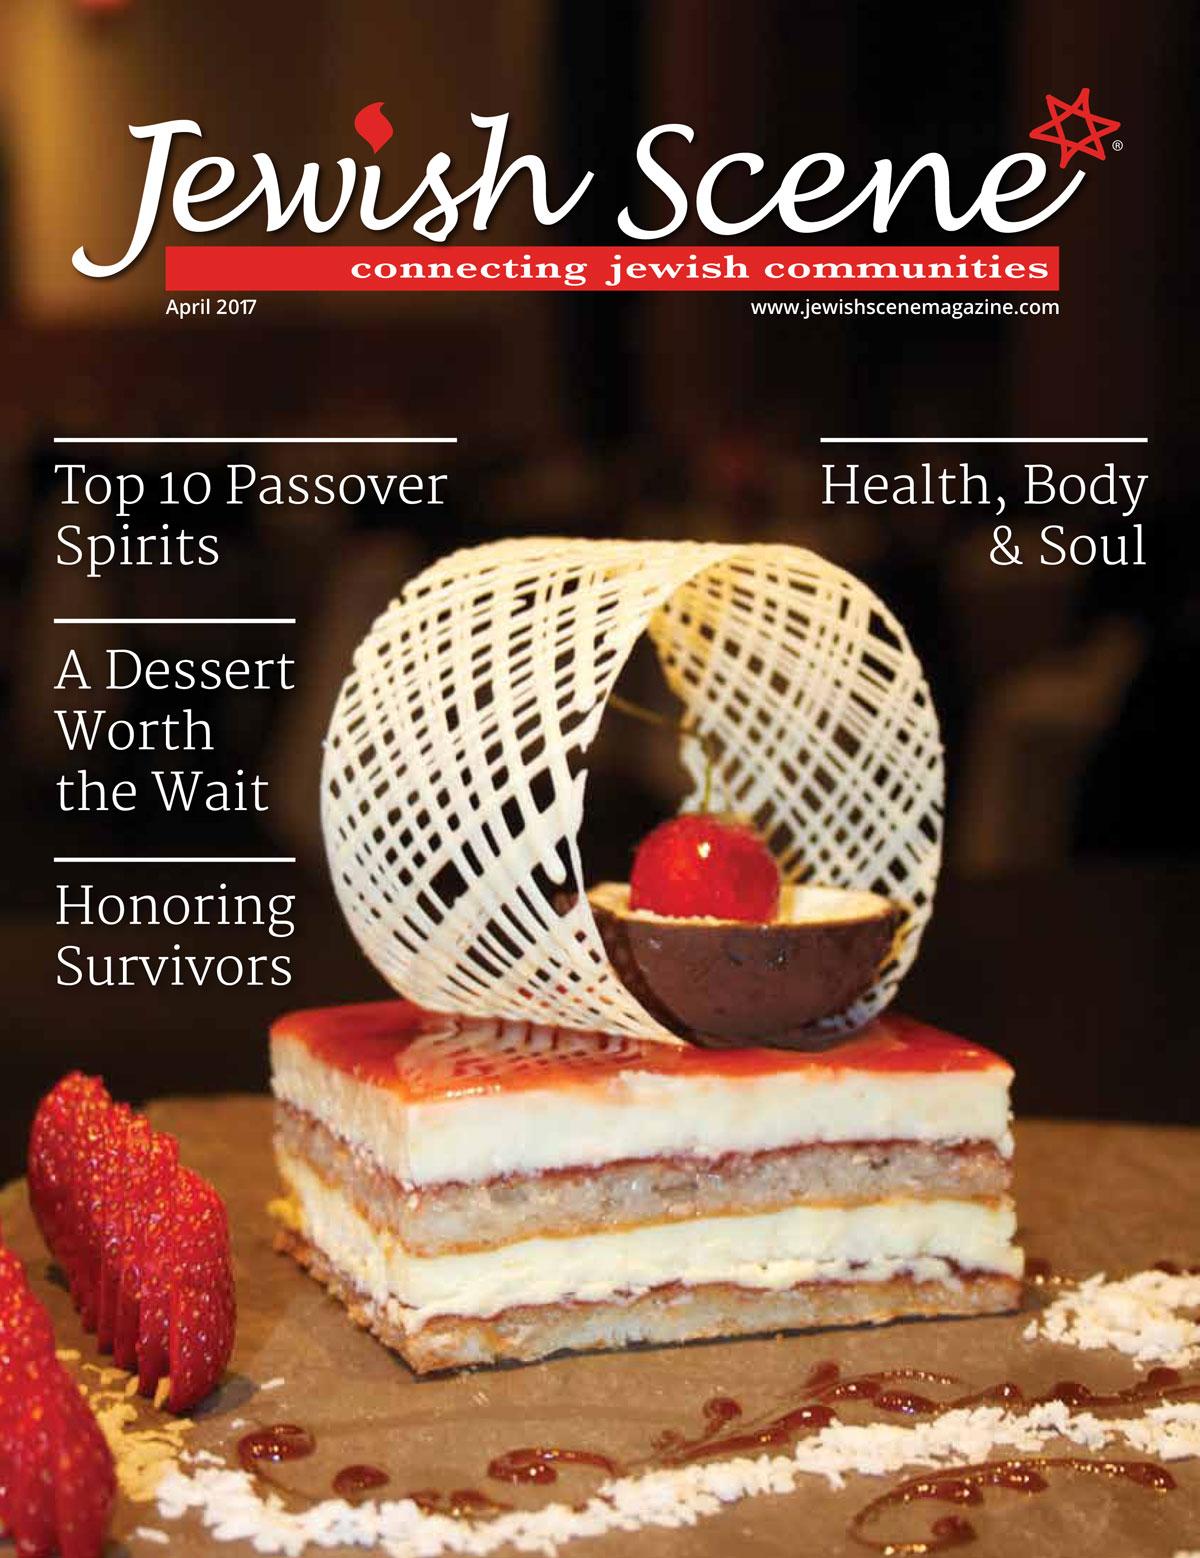 Jewish Scene April 2017 Cover